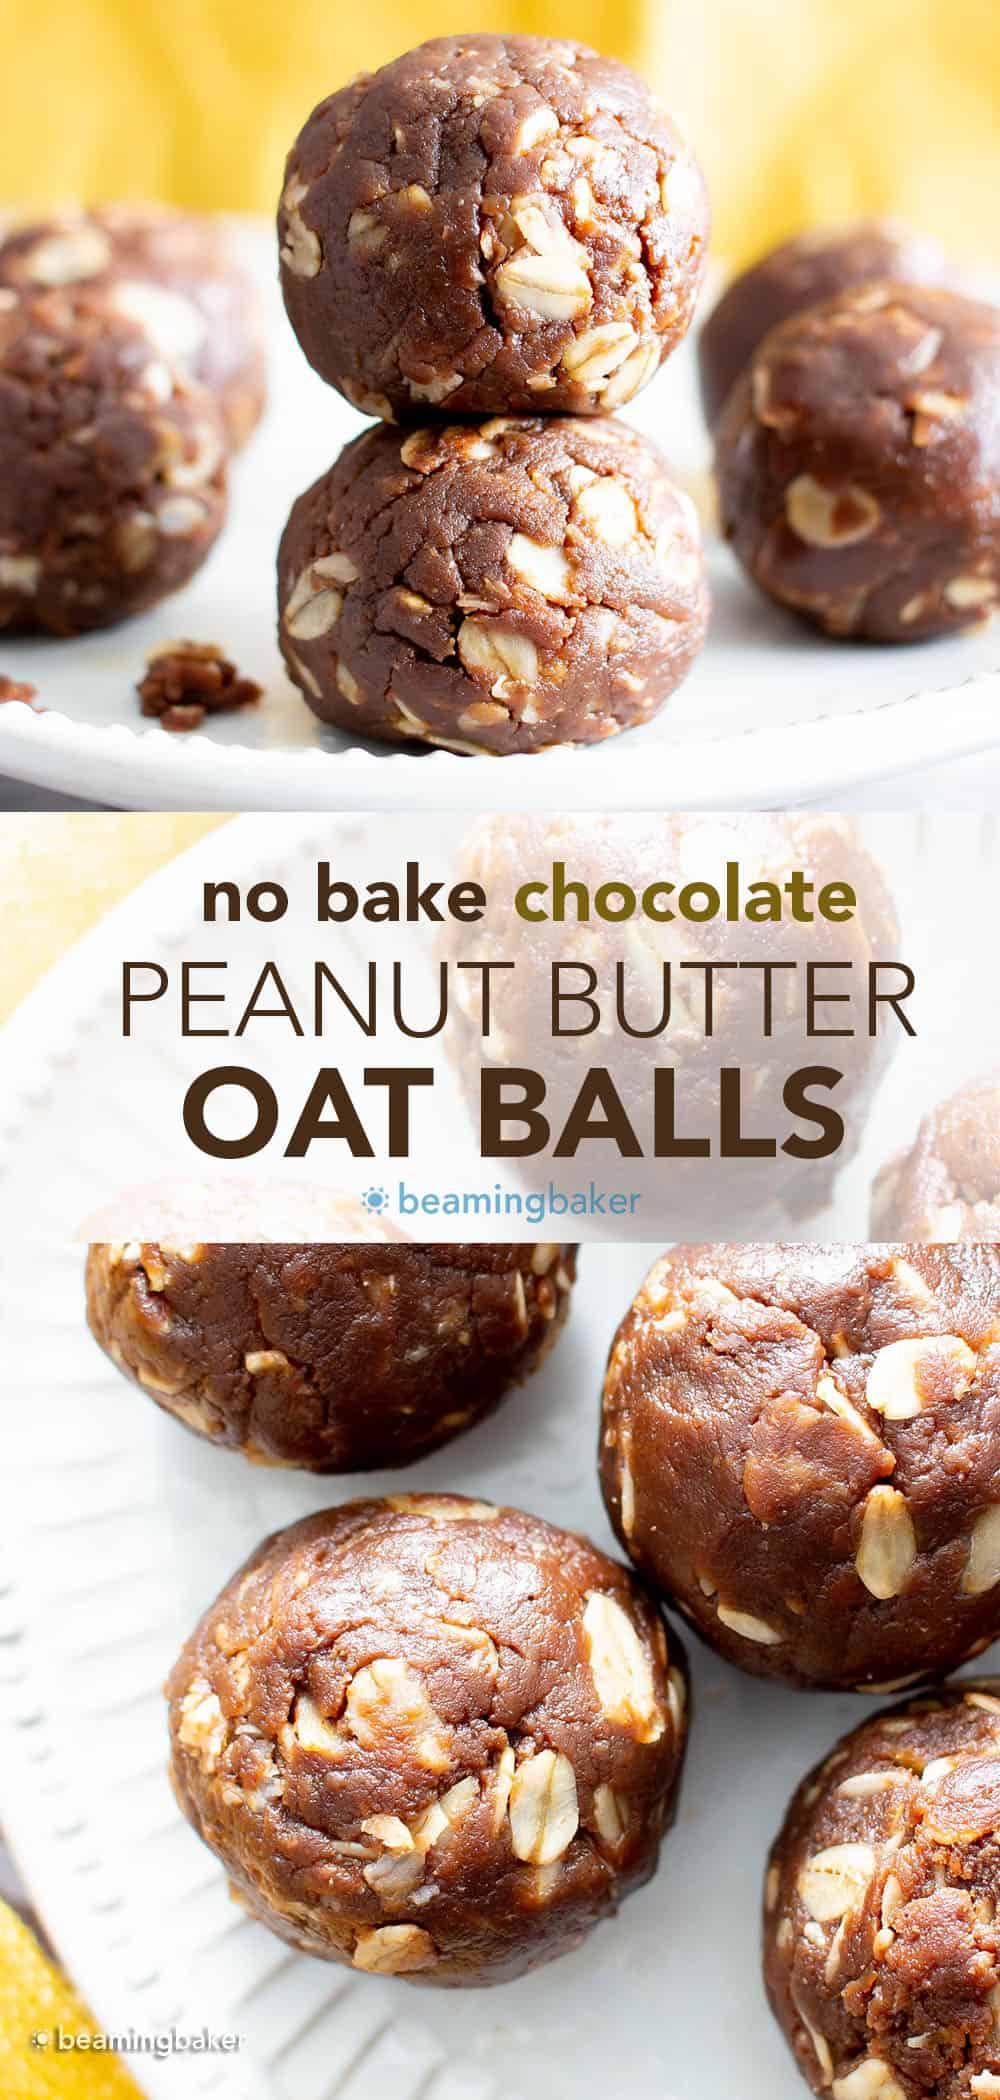 Chocolate Peanut Butter Oatmeal Balls: just 4 ingredients for the easiest chocolate peanut butter oatmeal balls made with healthy ingredients. No bake. #Chocolate #PeanutButter #Oatmeal #NoBake   Recipe at BeamingBaker.com